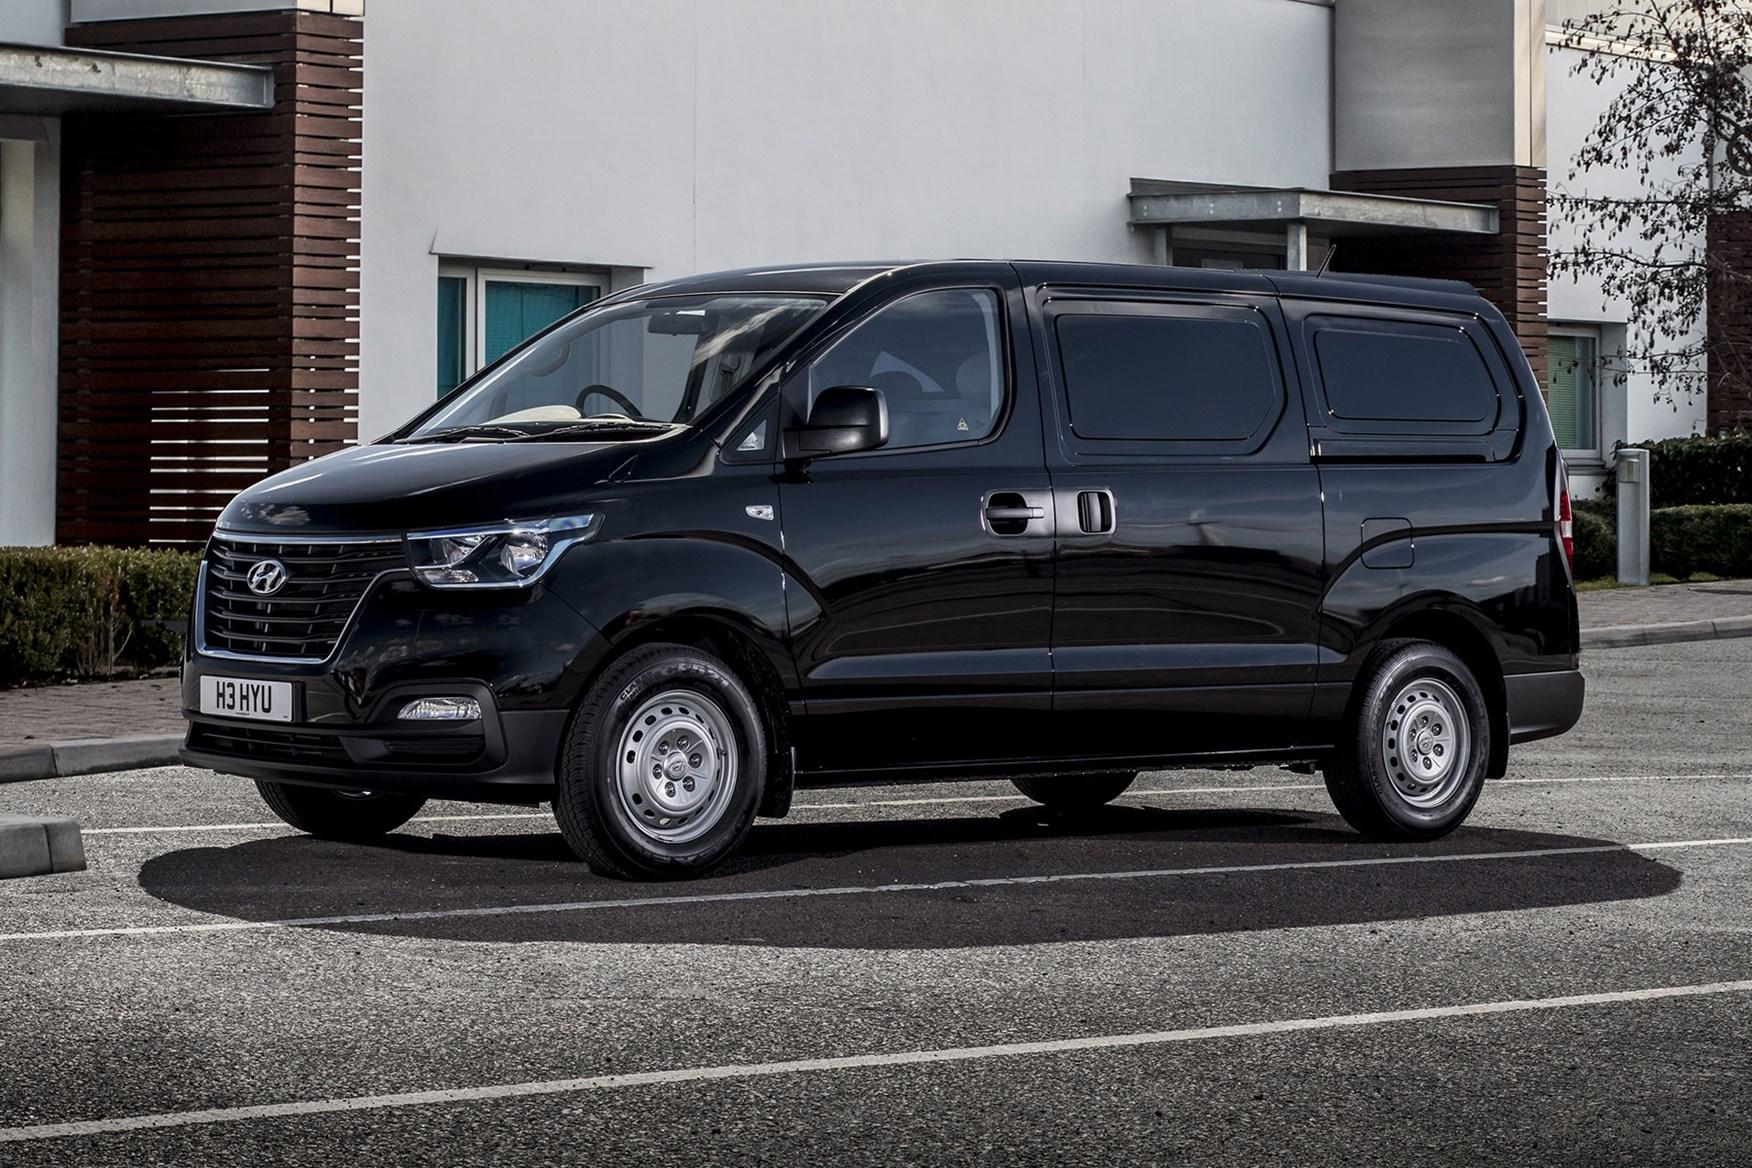 Hyundai iLoad review, 2018 facelift model, front view, black